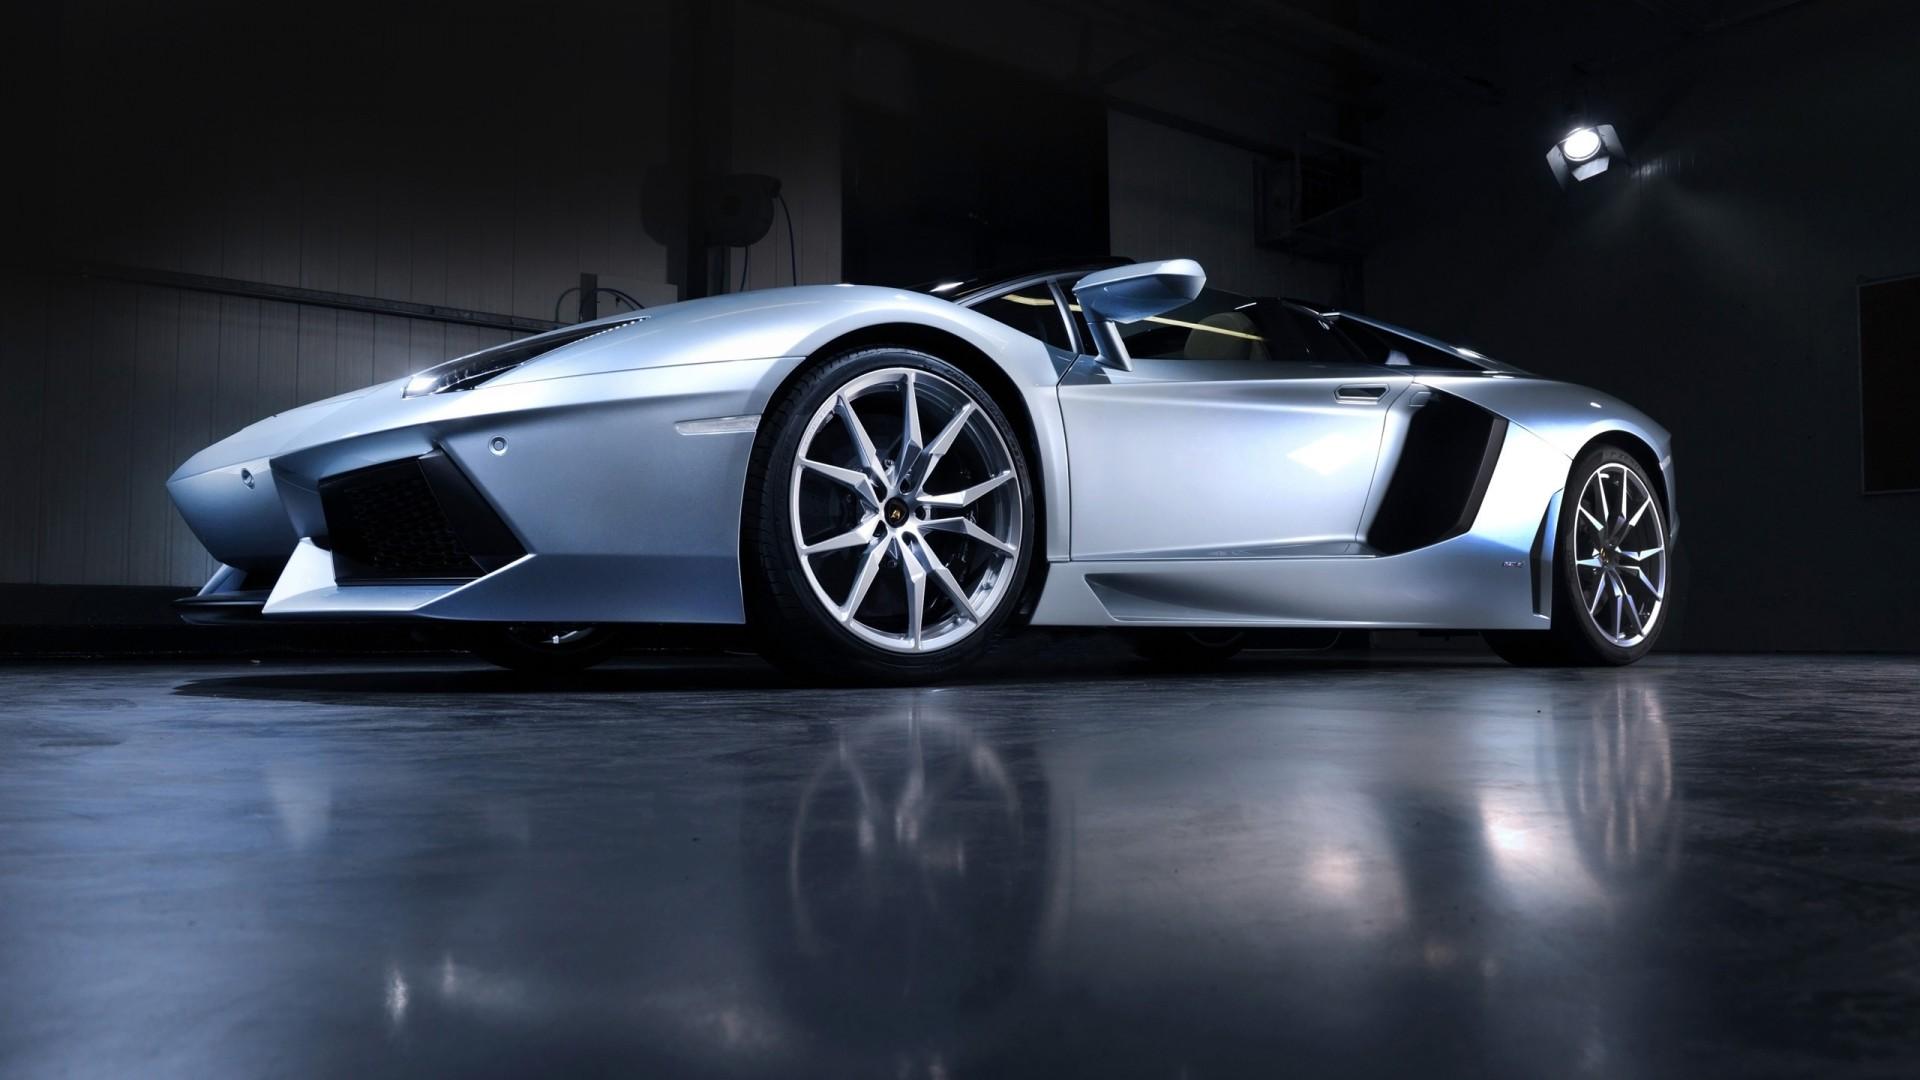 Lamborghini Aventador Lp 700 4 Roadster Wallpaper Hd Car